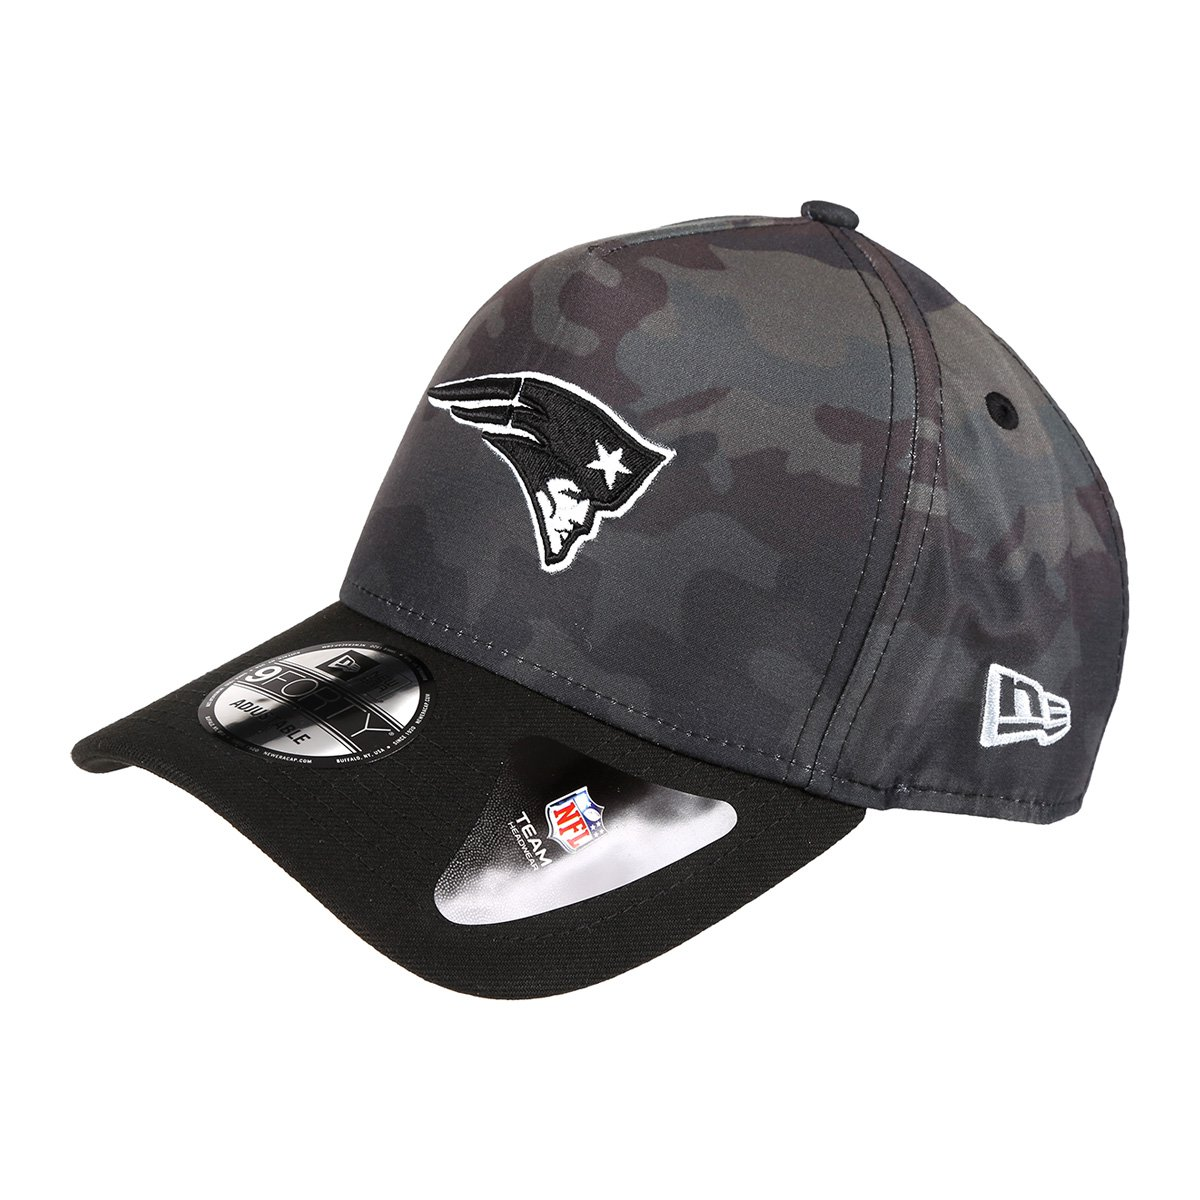 Boné New Era NFL New England Patriots Aba Curva 940 Af Sn Camo - Verde  Militar - Compre Agora  1247baa7f68